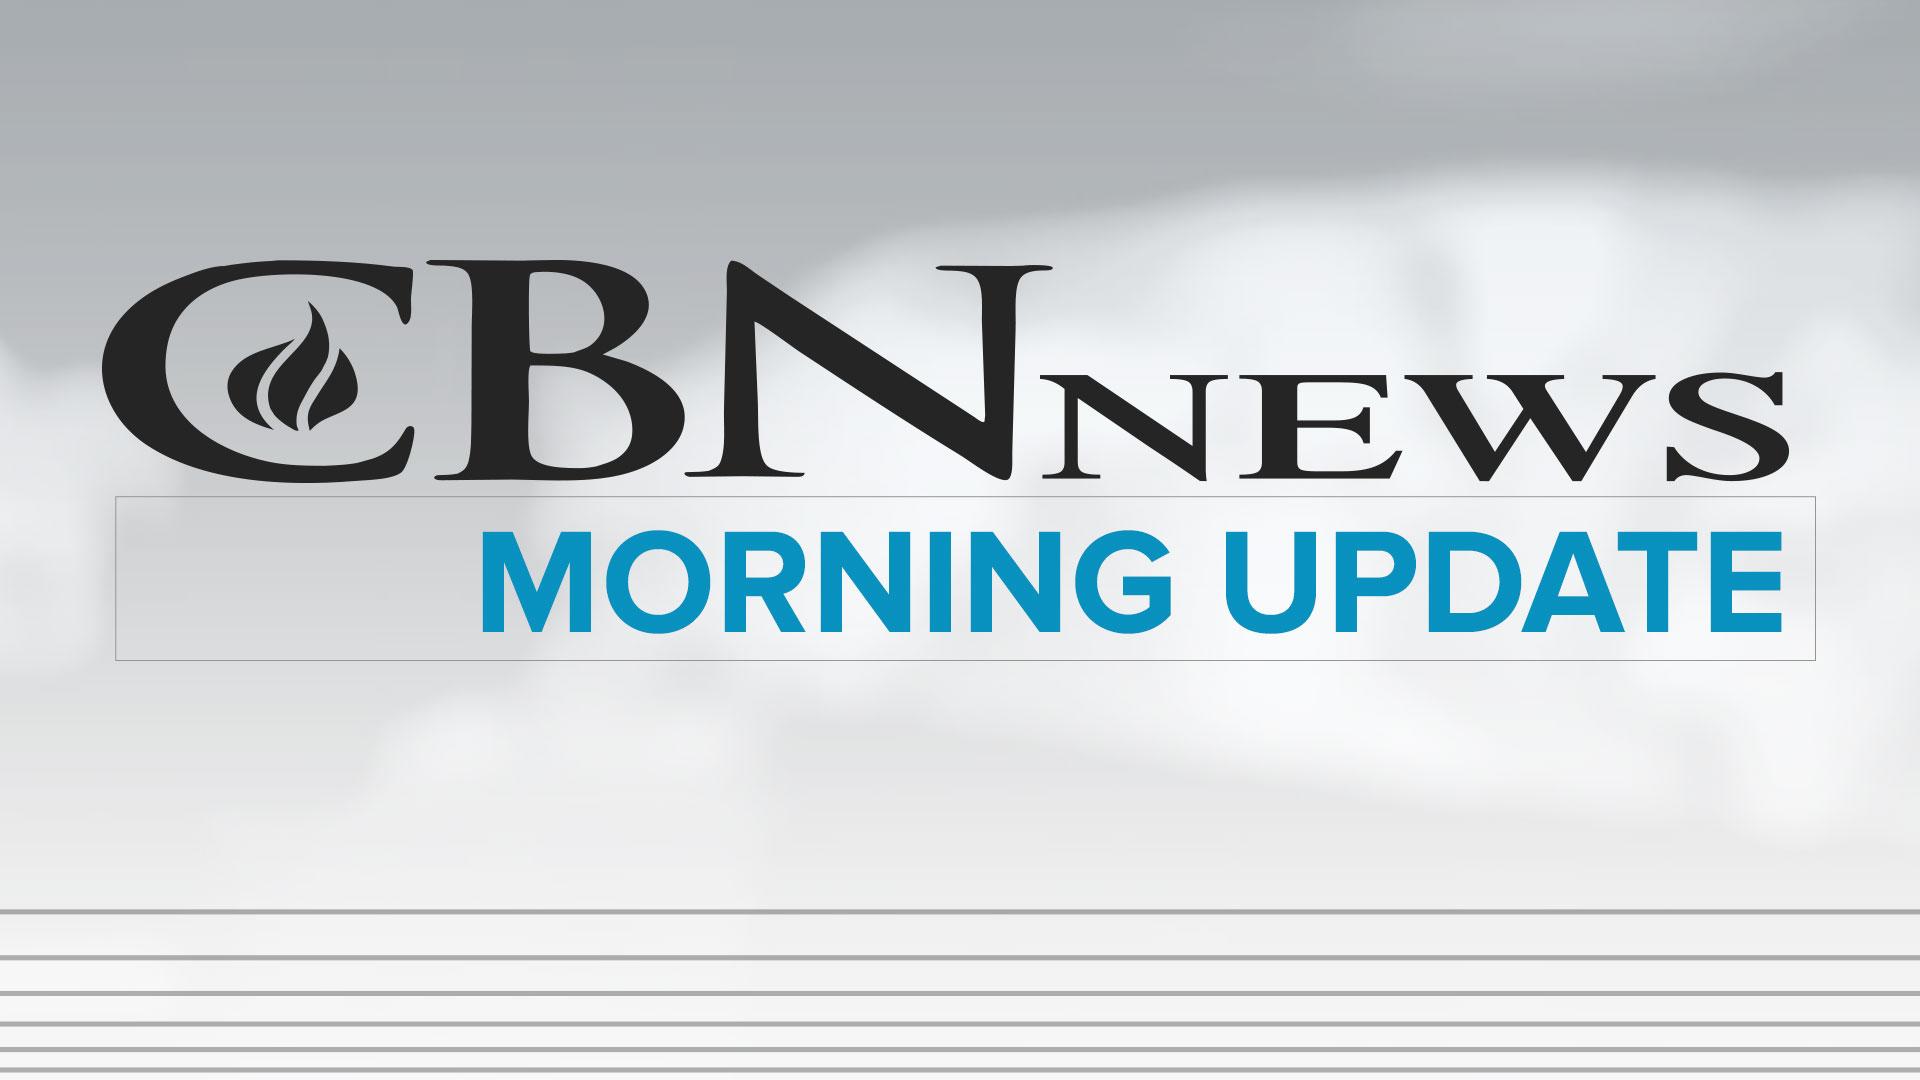 CBN News Morning Update